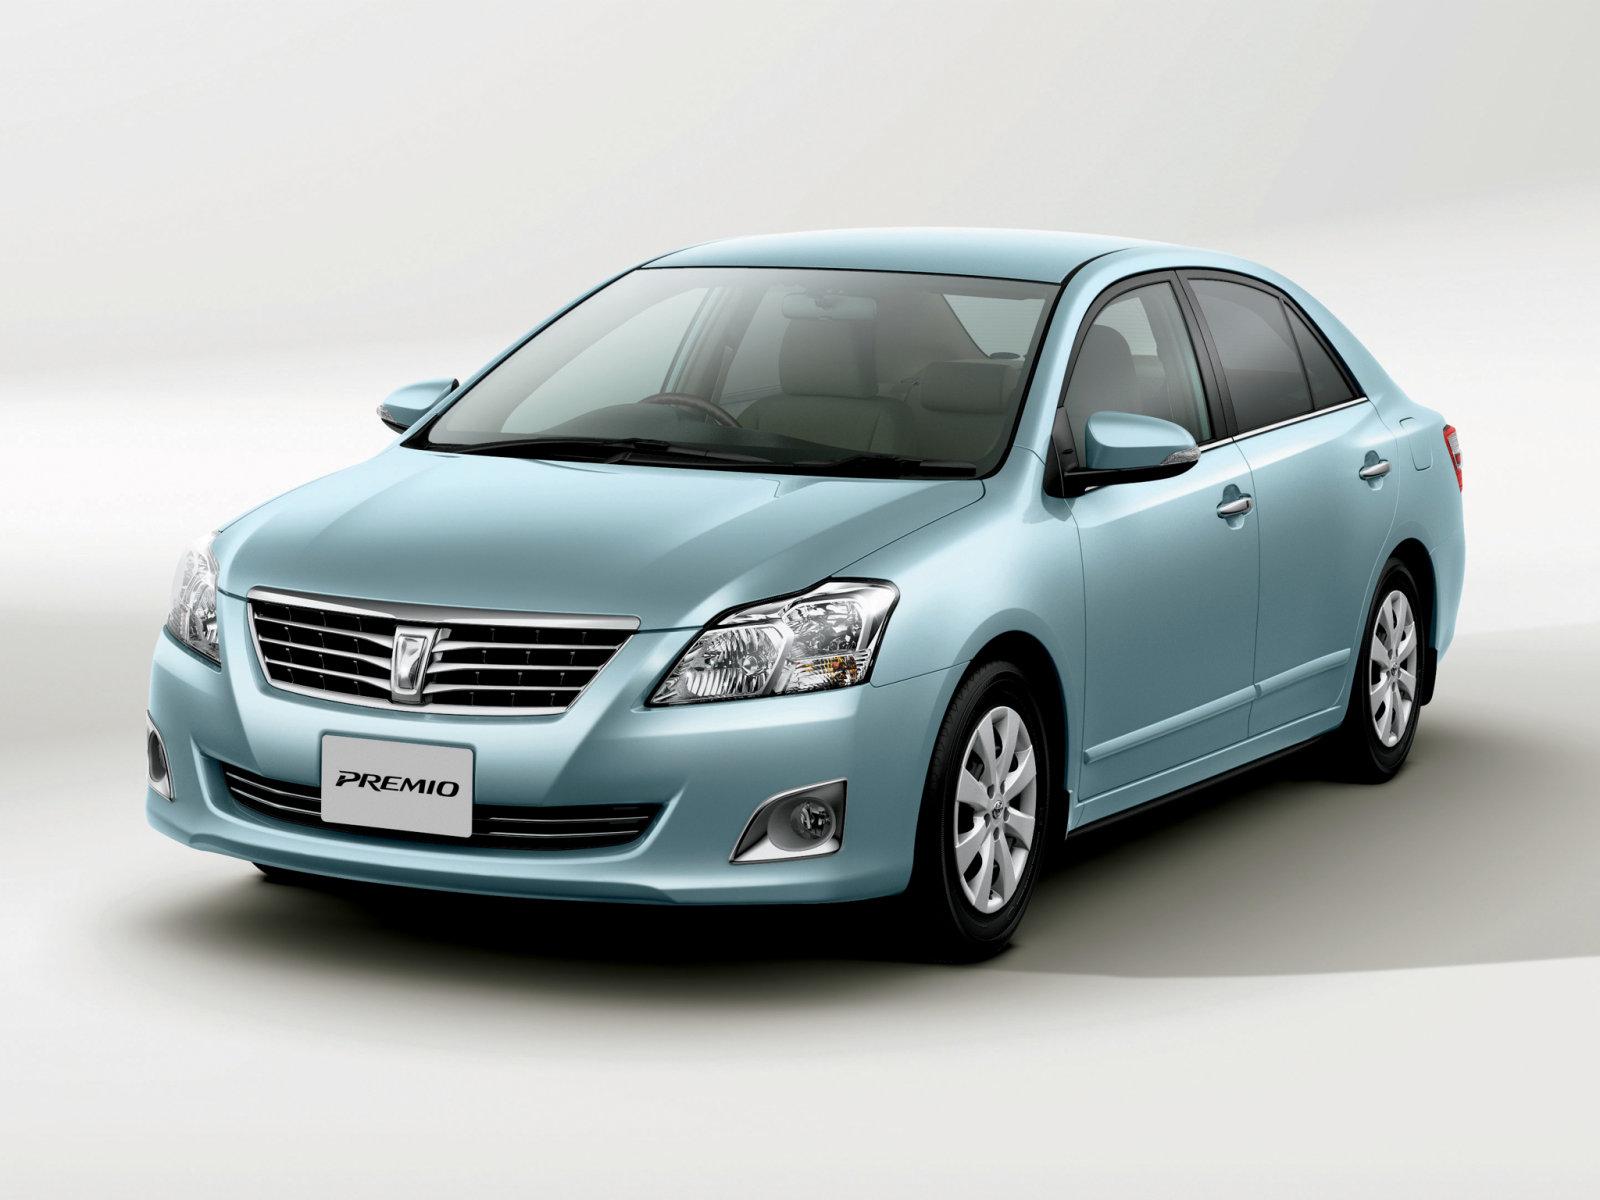 Toyota Premio Photos Photogallery With 4 Pics Carsbase Com